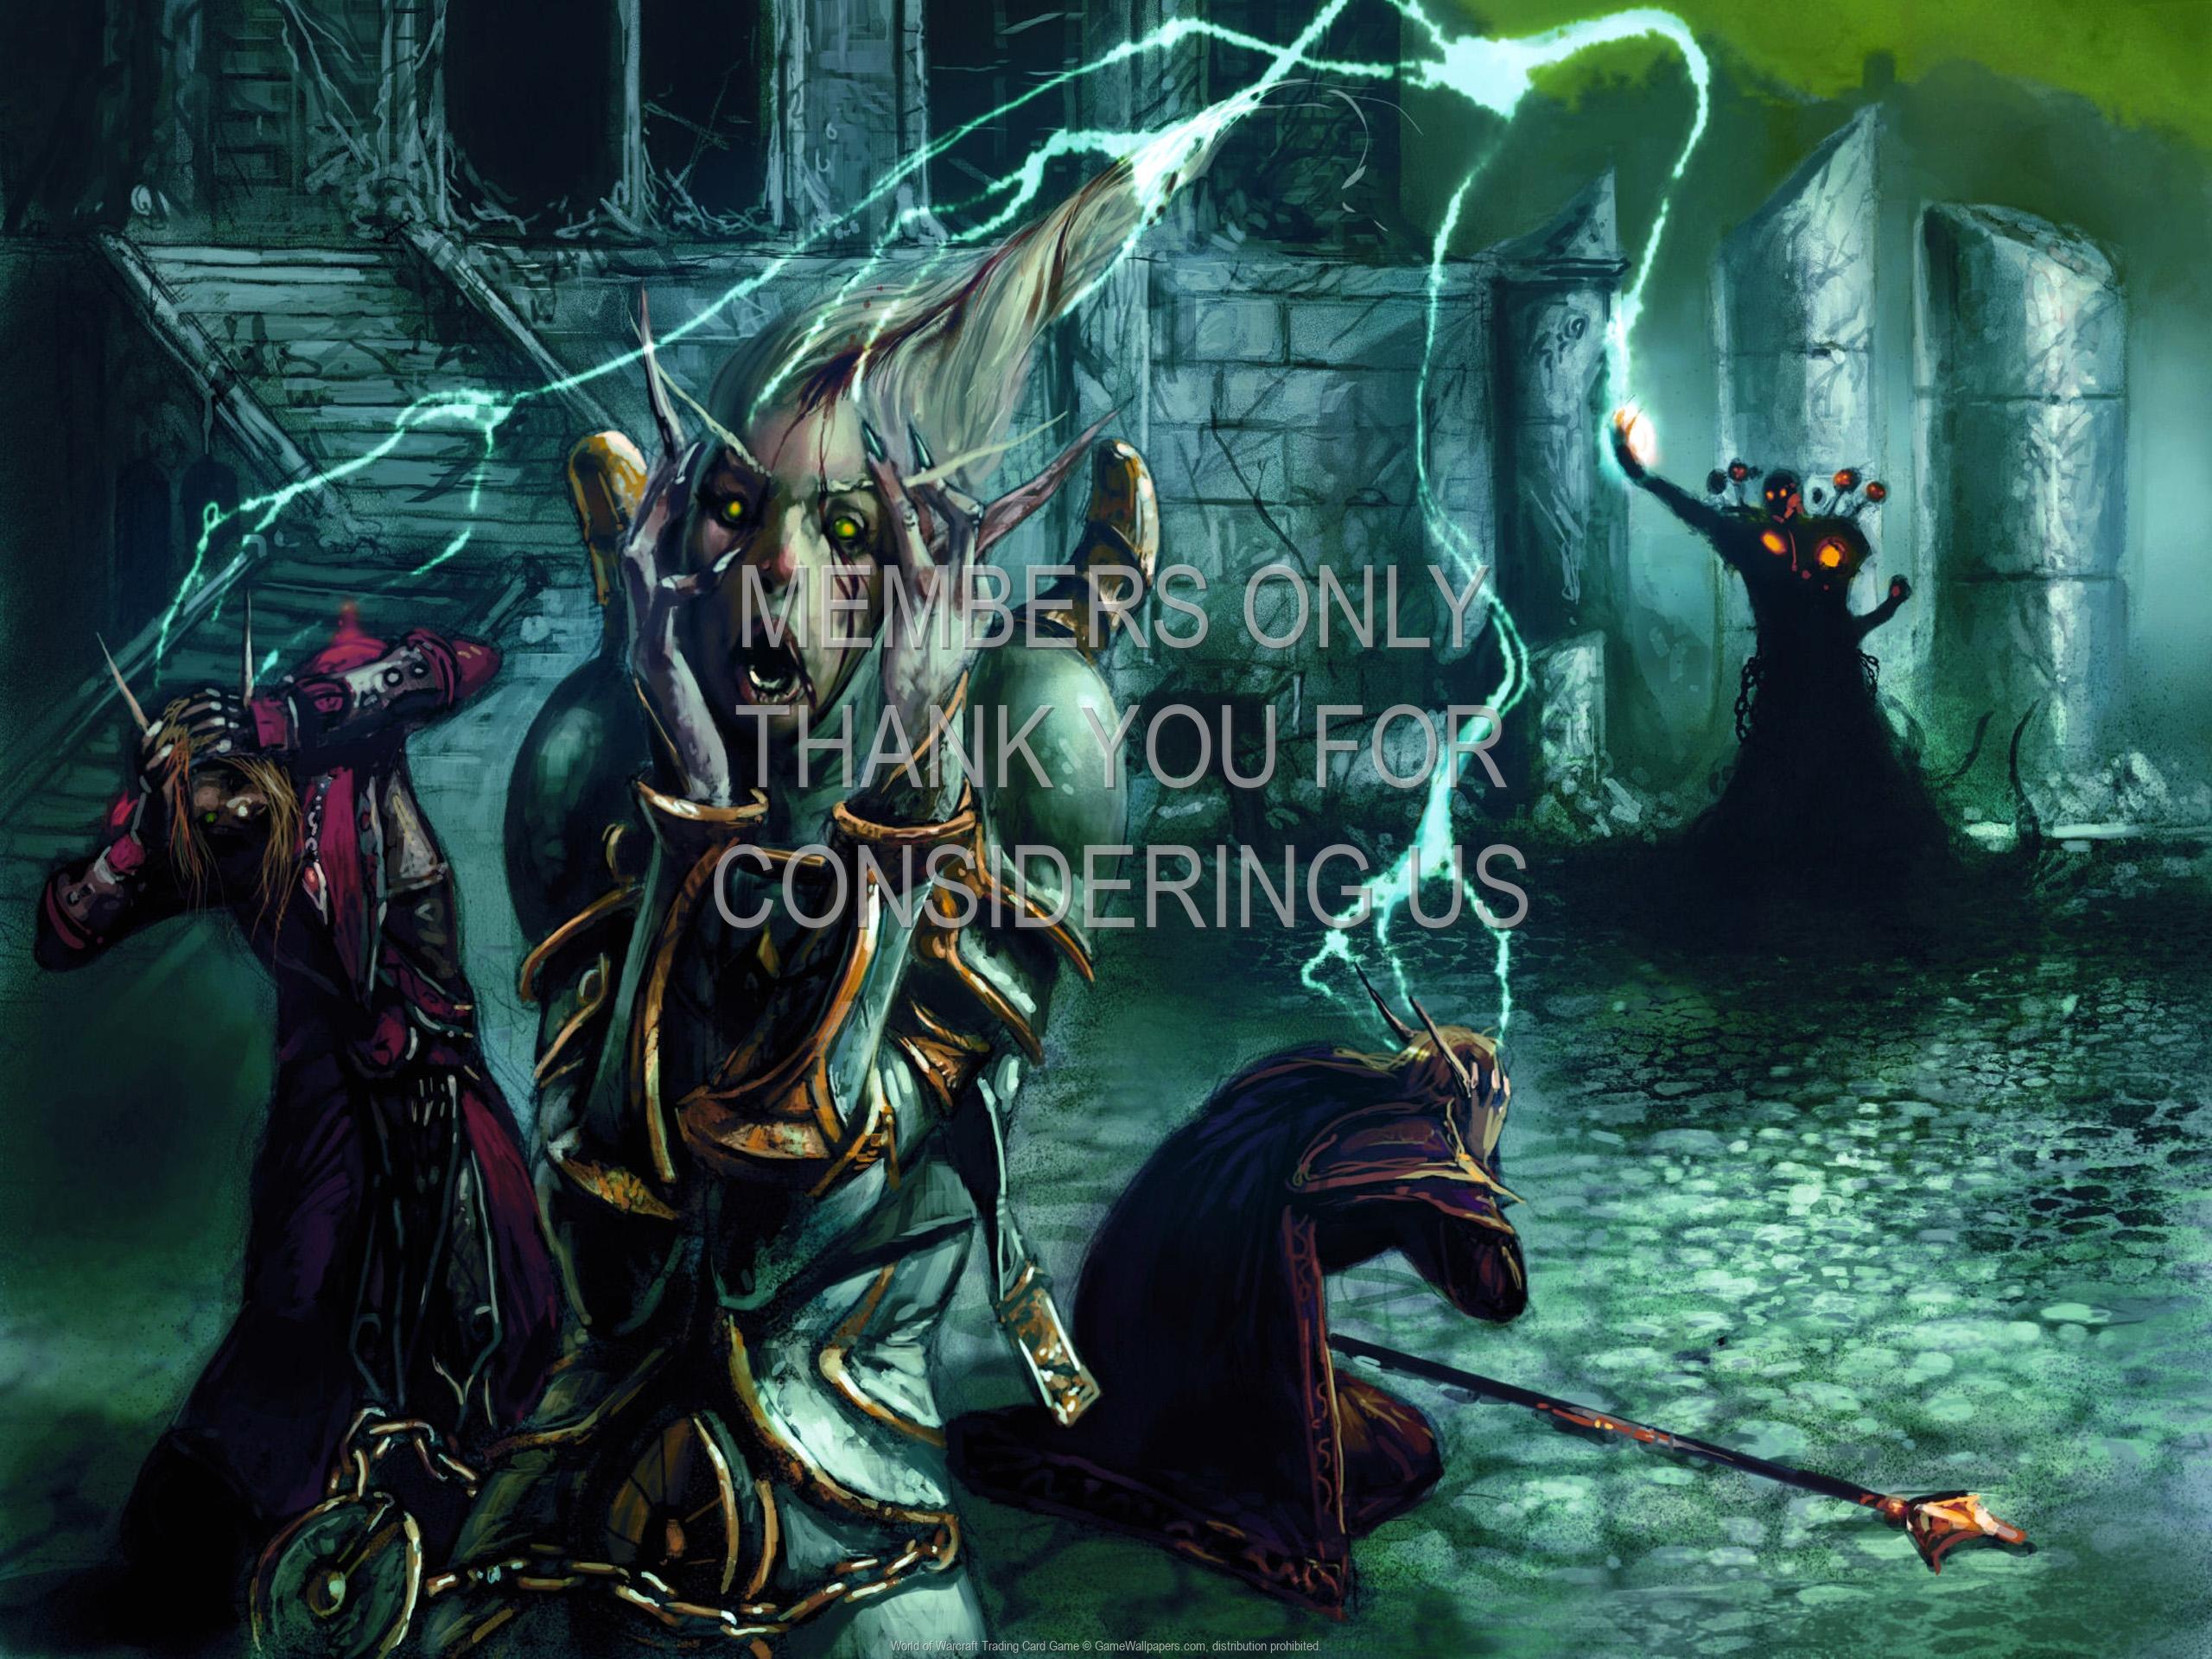 World of Warcraft: Trading Card Game 1920x1080 Handy Hintergrundbild 34